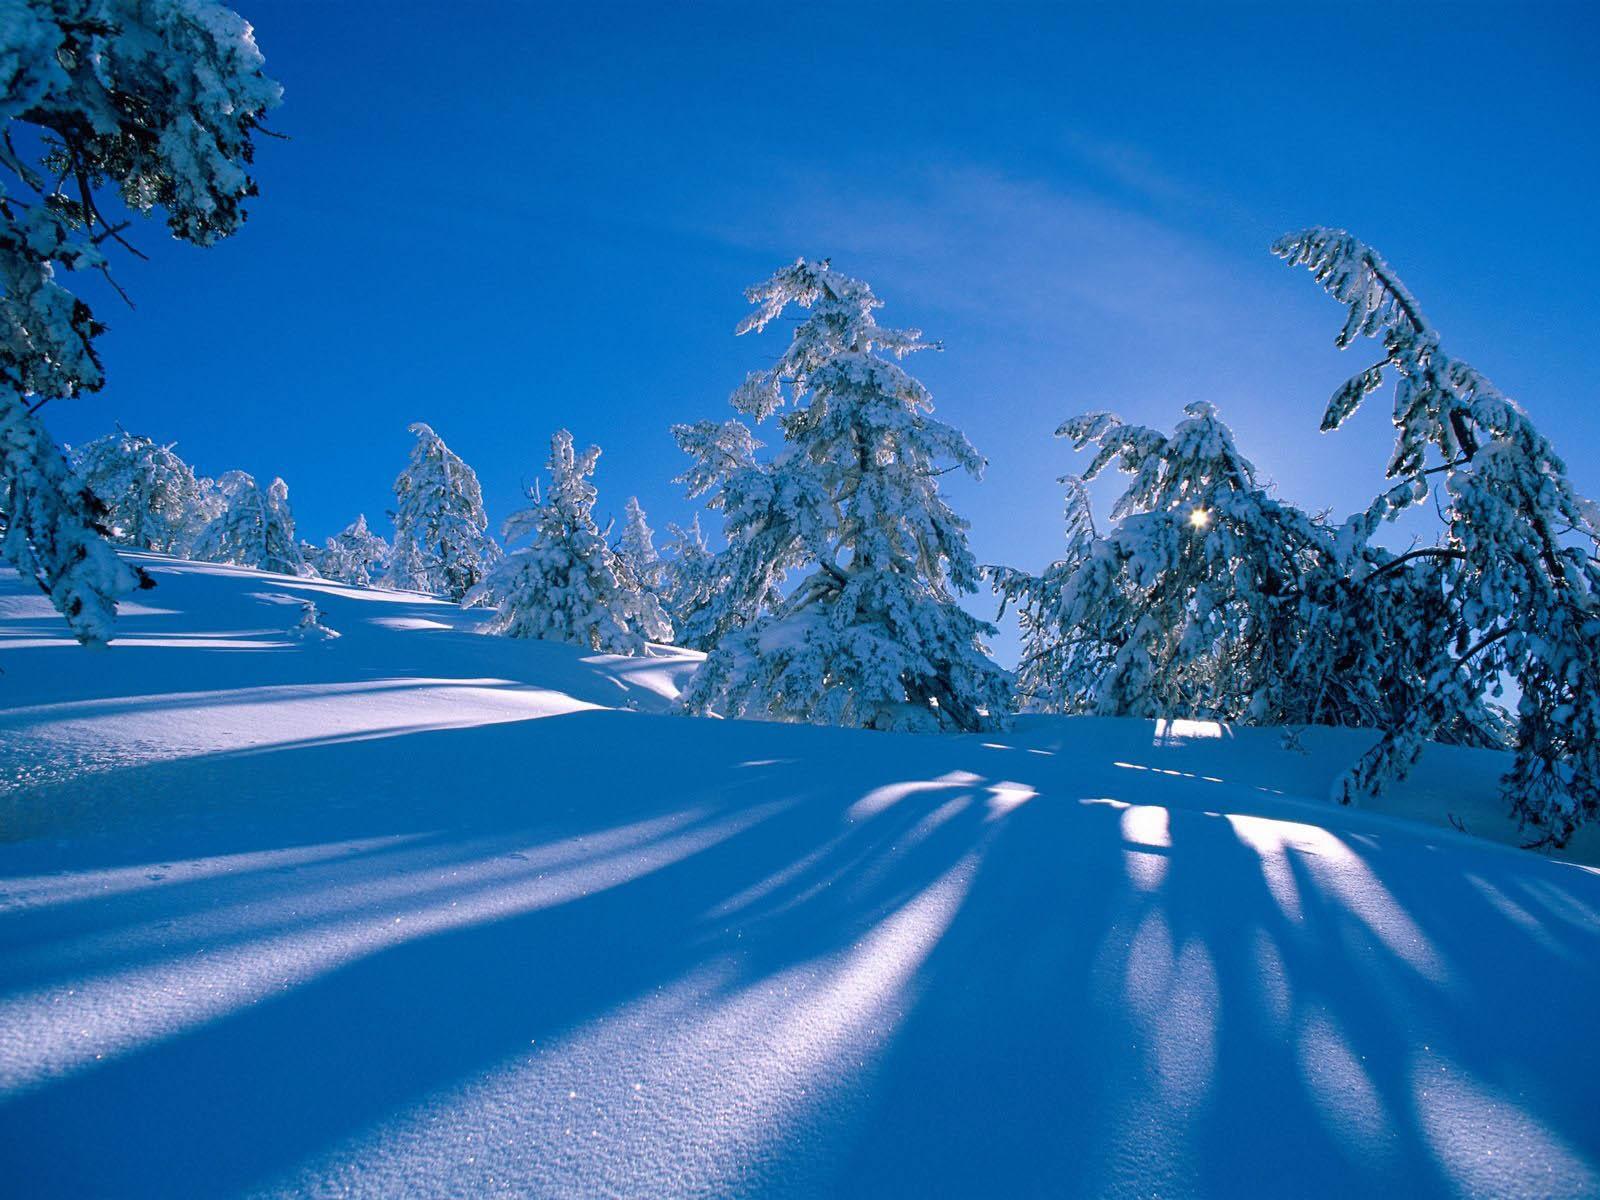 Wallpaper: Winter Desktop Wallpapers And Backgrounds